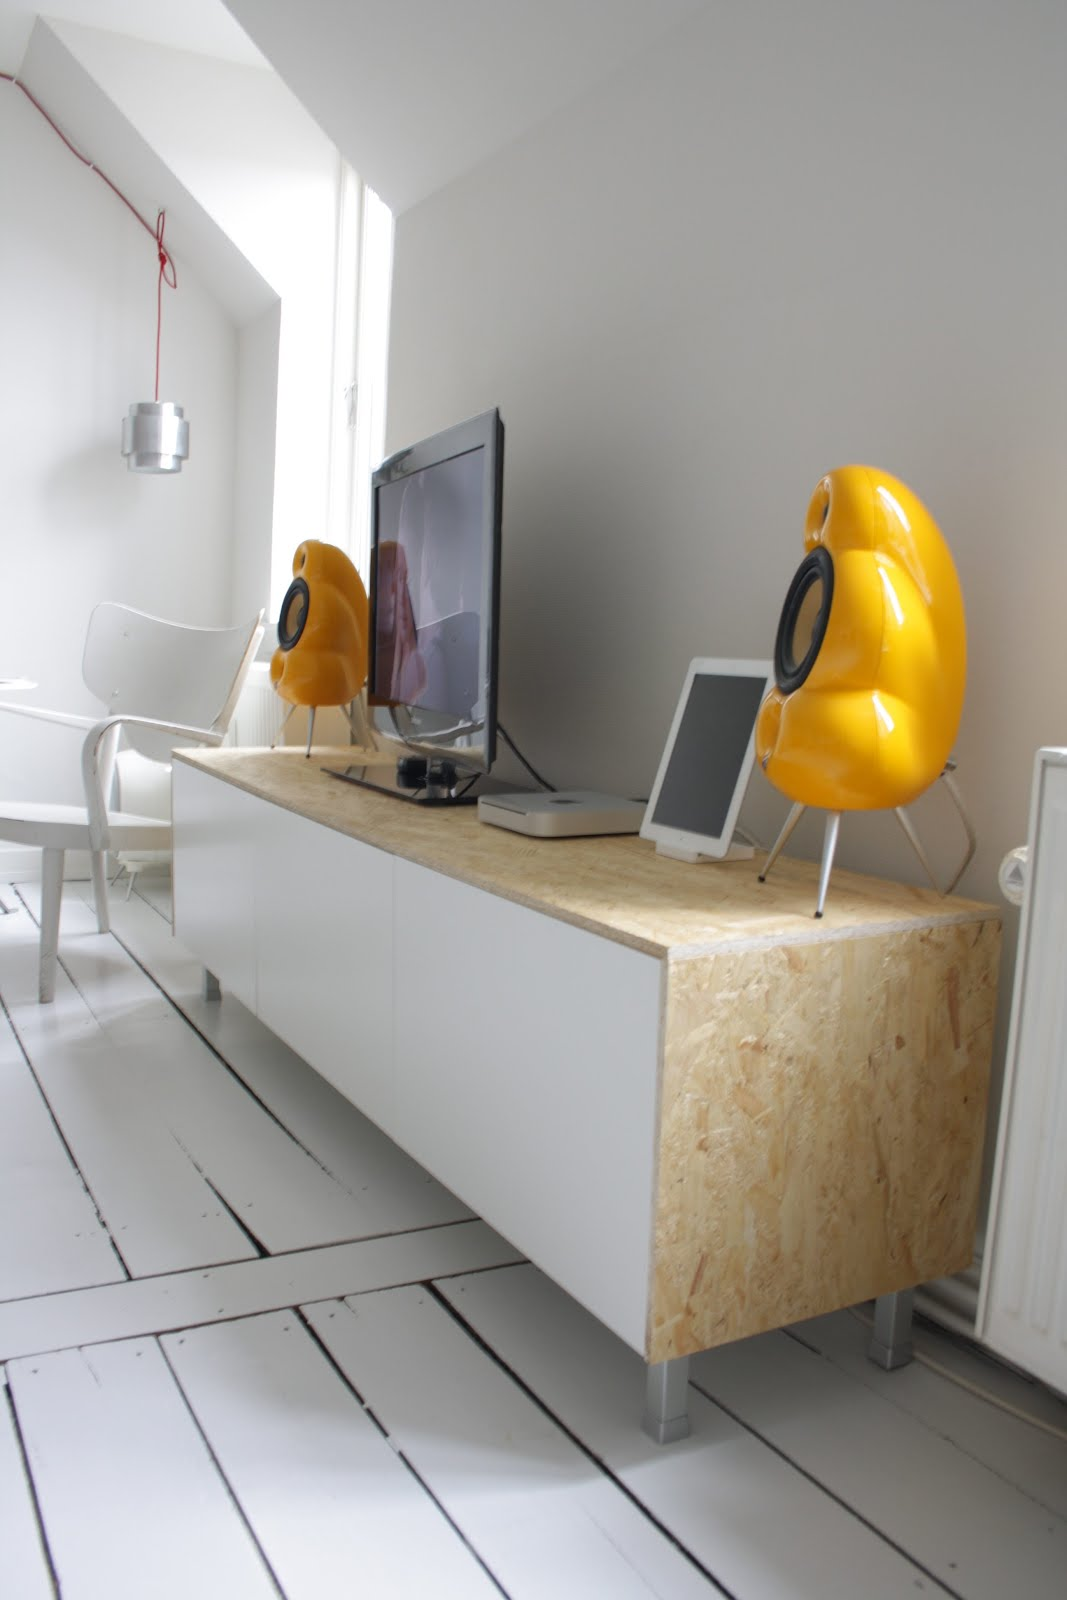 Meuble Tv Bureau Ikea : Clean, Sleek Media Console From Besta – Ikea Hackers – Ikea Hackers